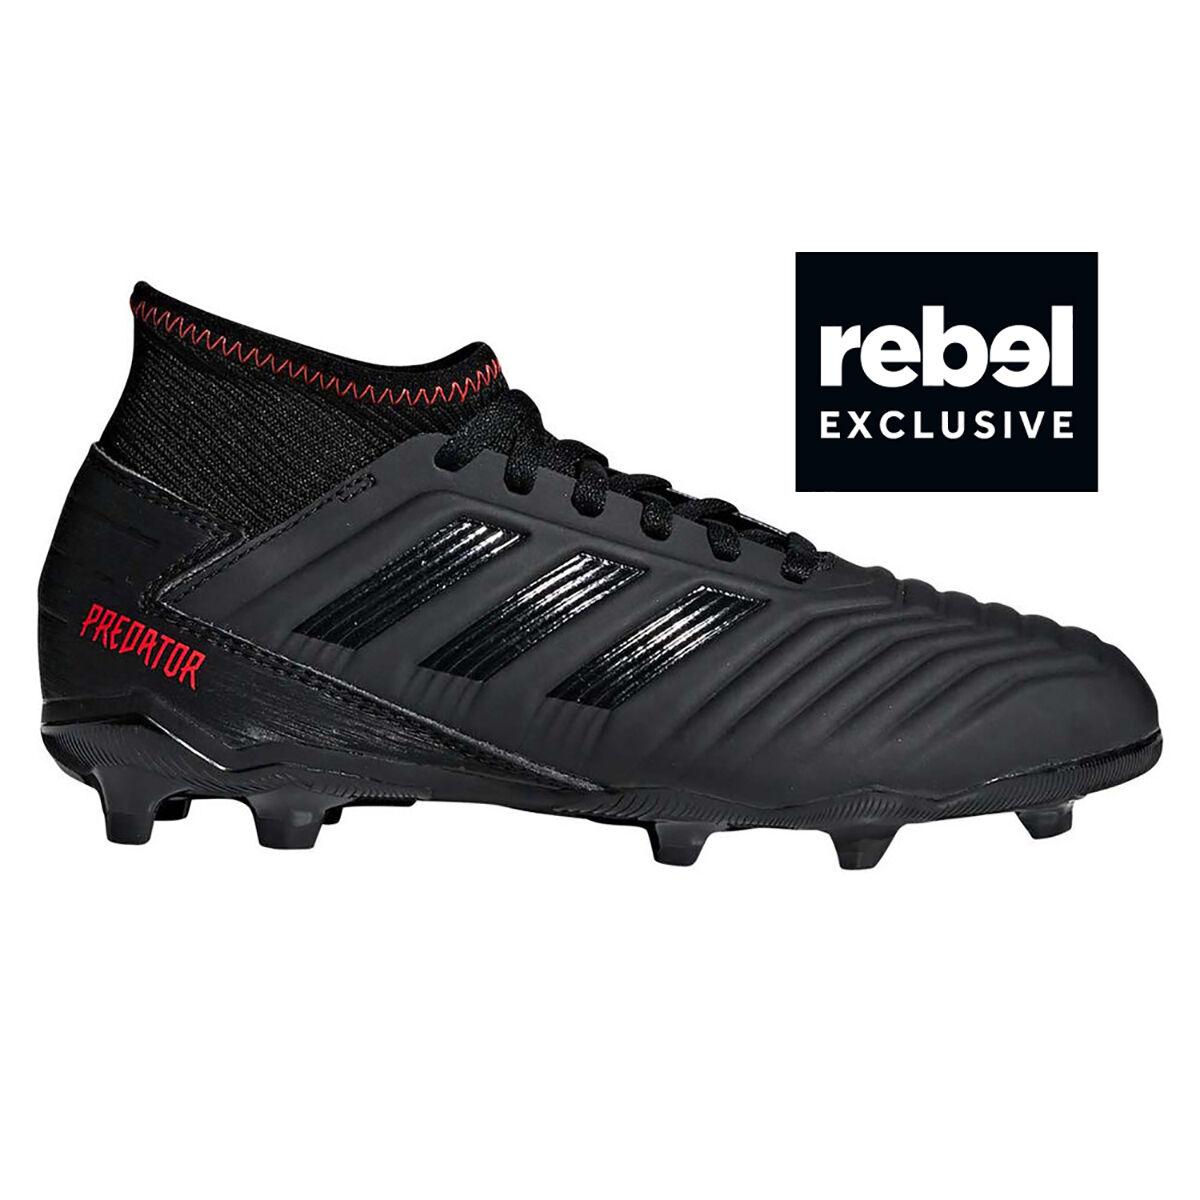 b17ad7e8084 ... best price adidas predator 19.3 kids football boots black red rebelhi  res aae47 97a4f